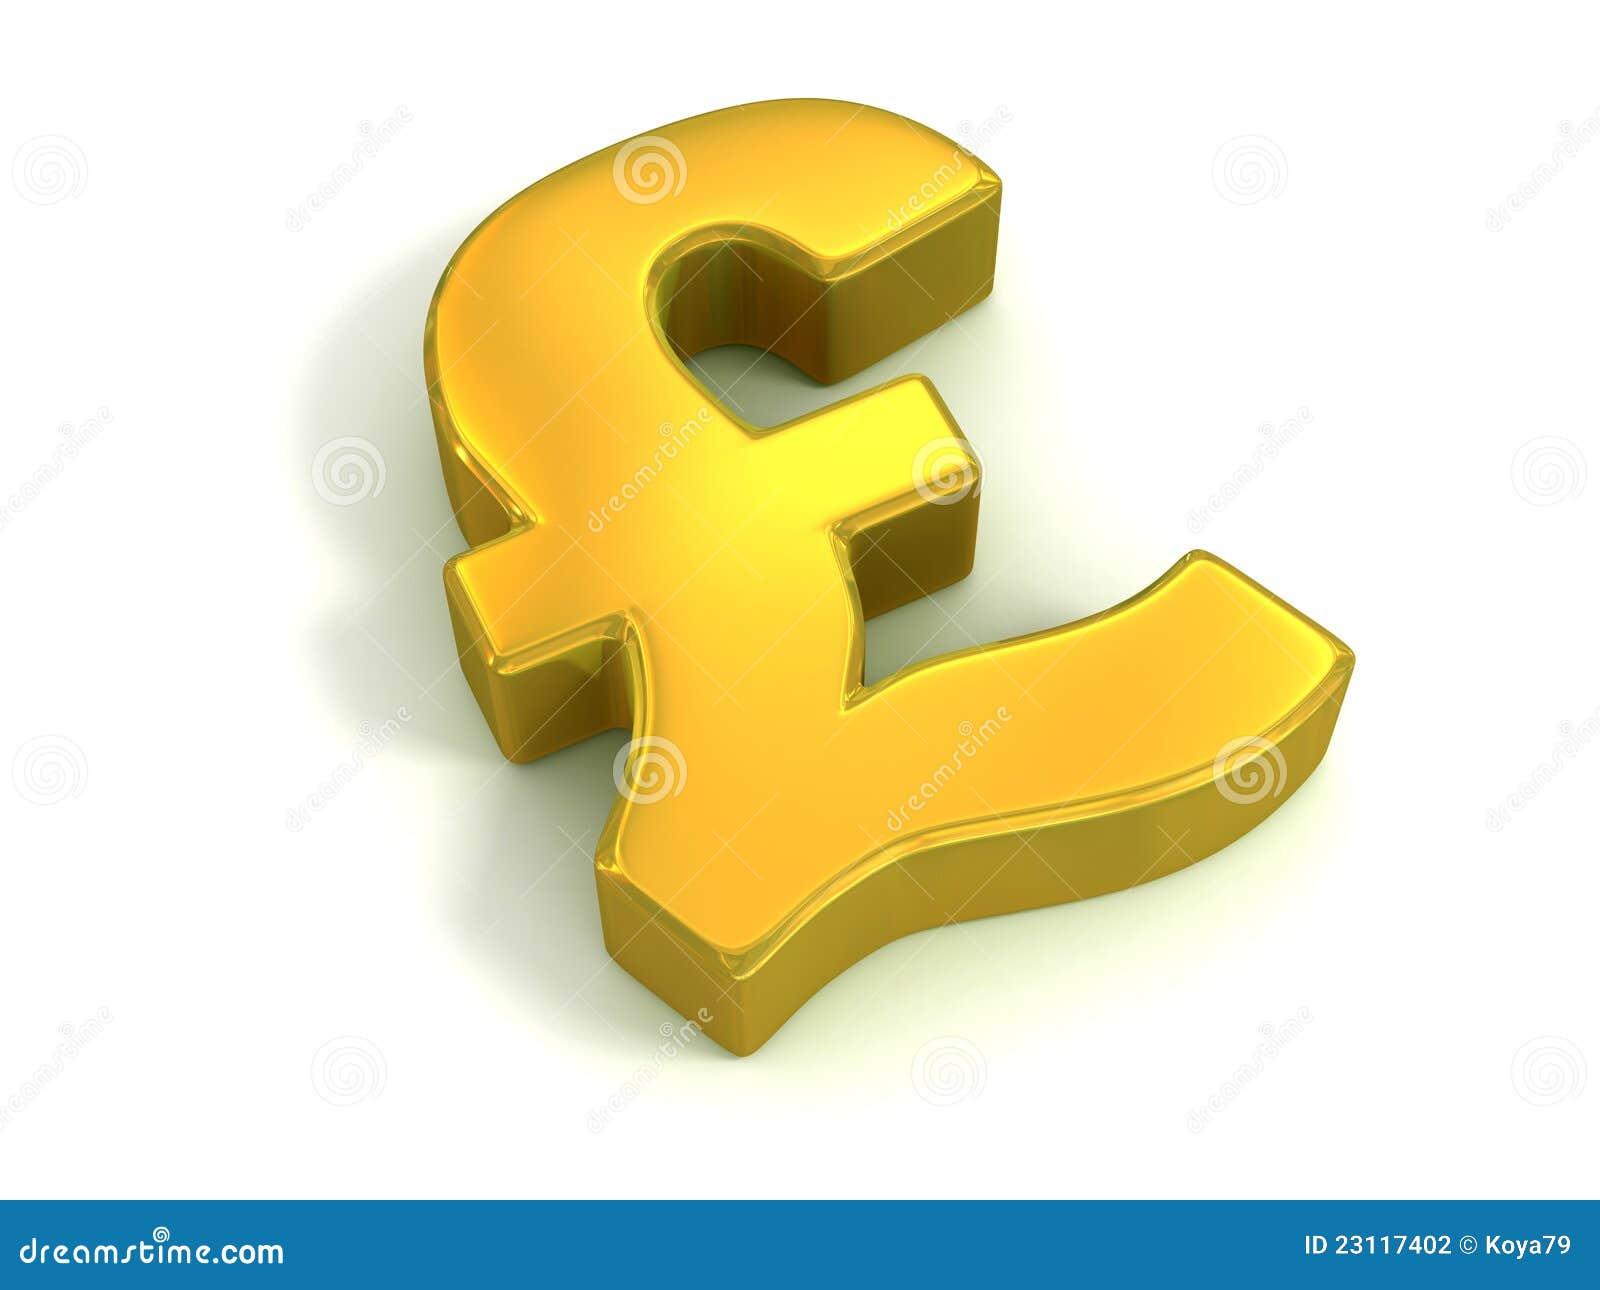 Golden british pound symbol stock illustration illustration of golden british pound symbol biocorpaavc Choice Image